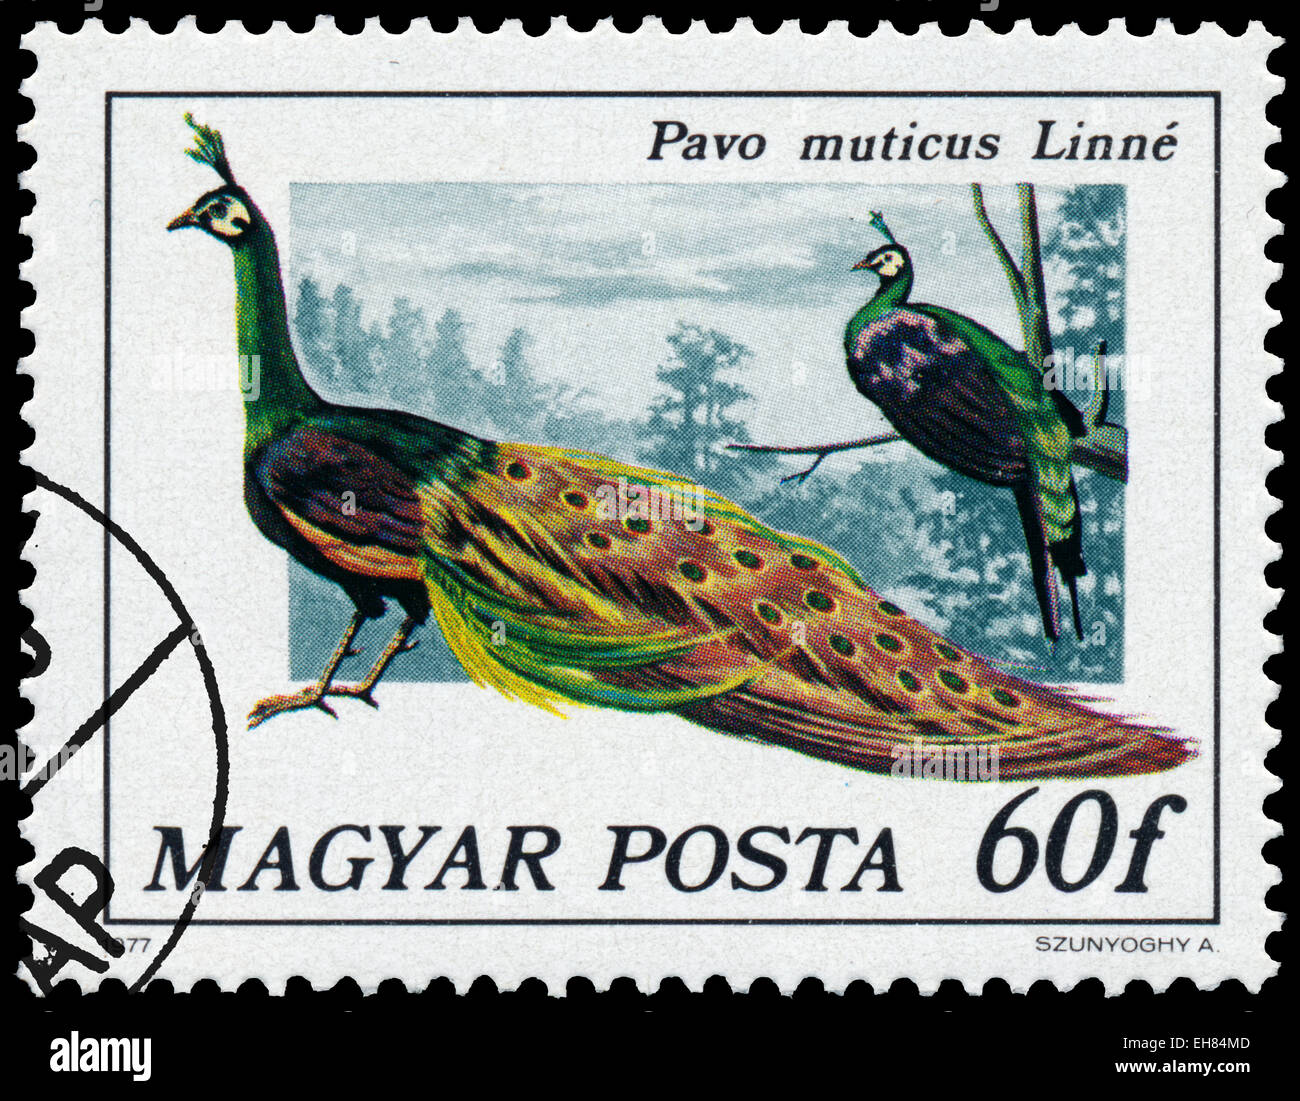 HUNGARY - CIRCA 1977: Stamp printed in Hungary shows Green peafowl - Pavo muticus Linne, series Peacock birds, circa - Stock Image